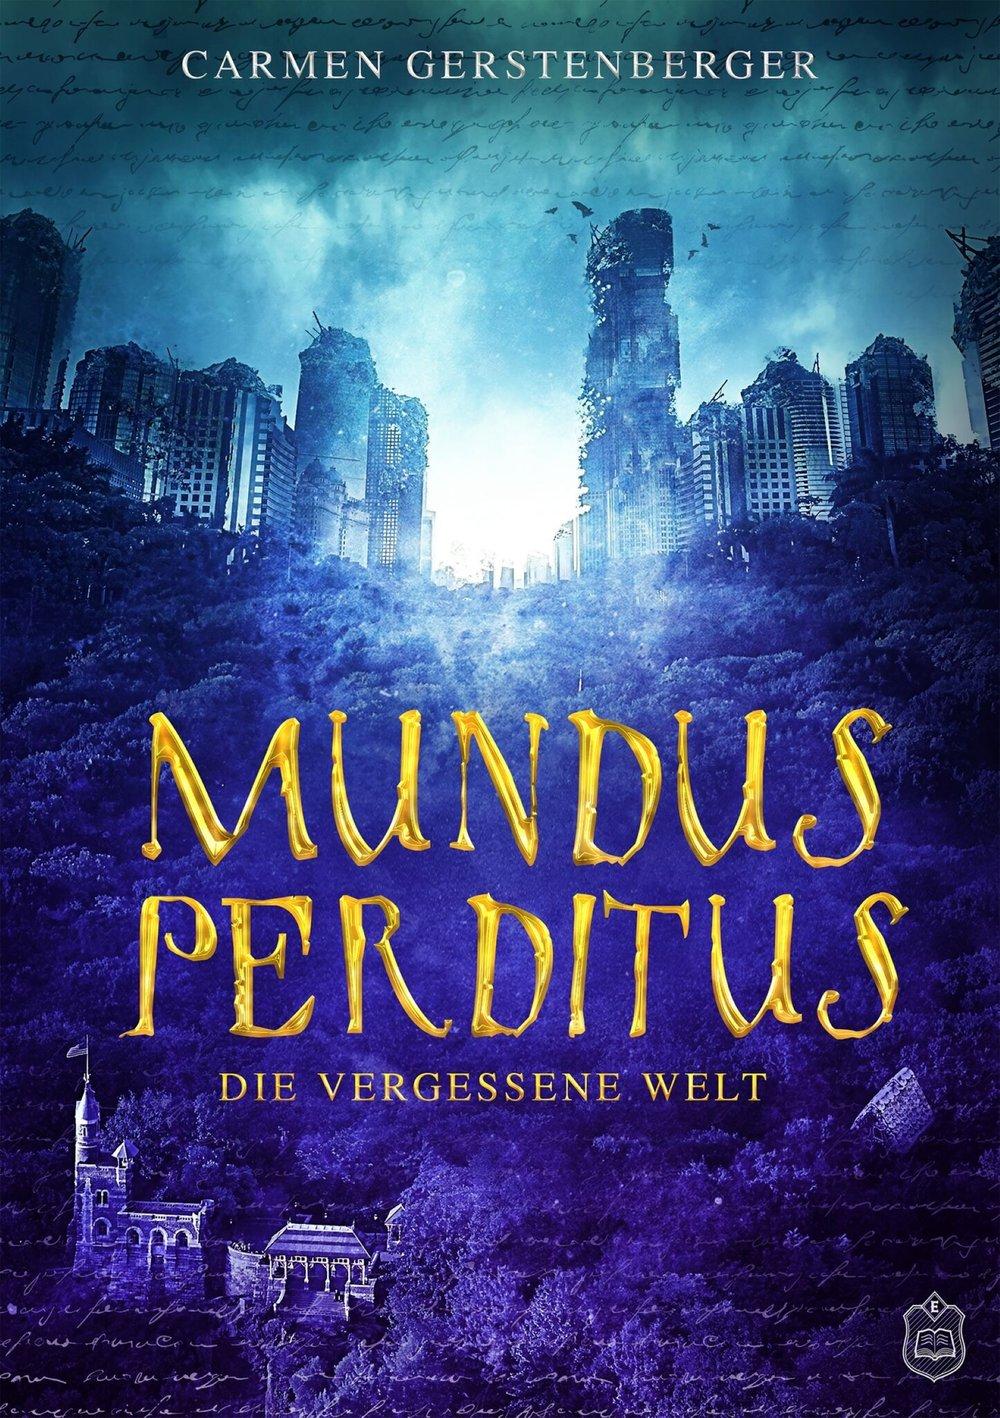 Gerstenberger_Carmen-Mundus_Perditus_phantastik-autoren-netzwerk.jpg